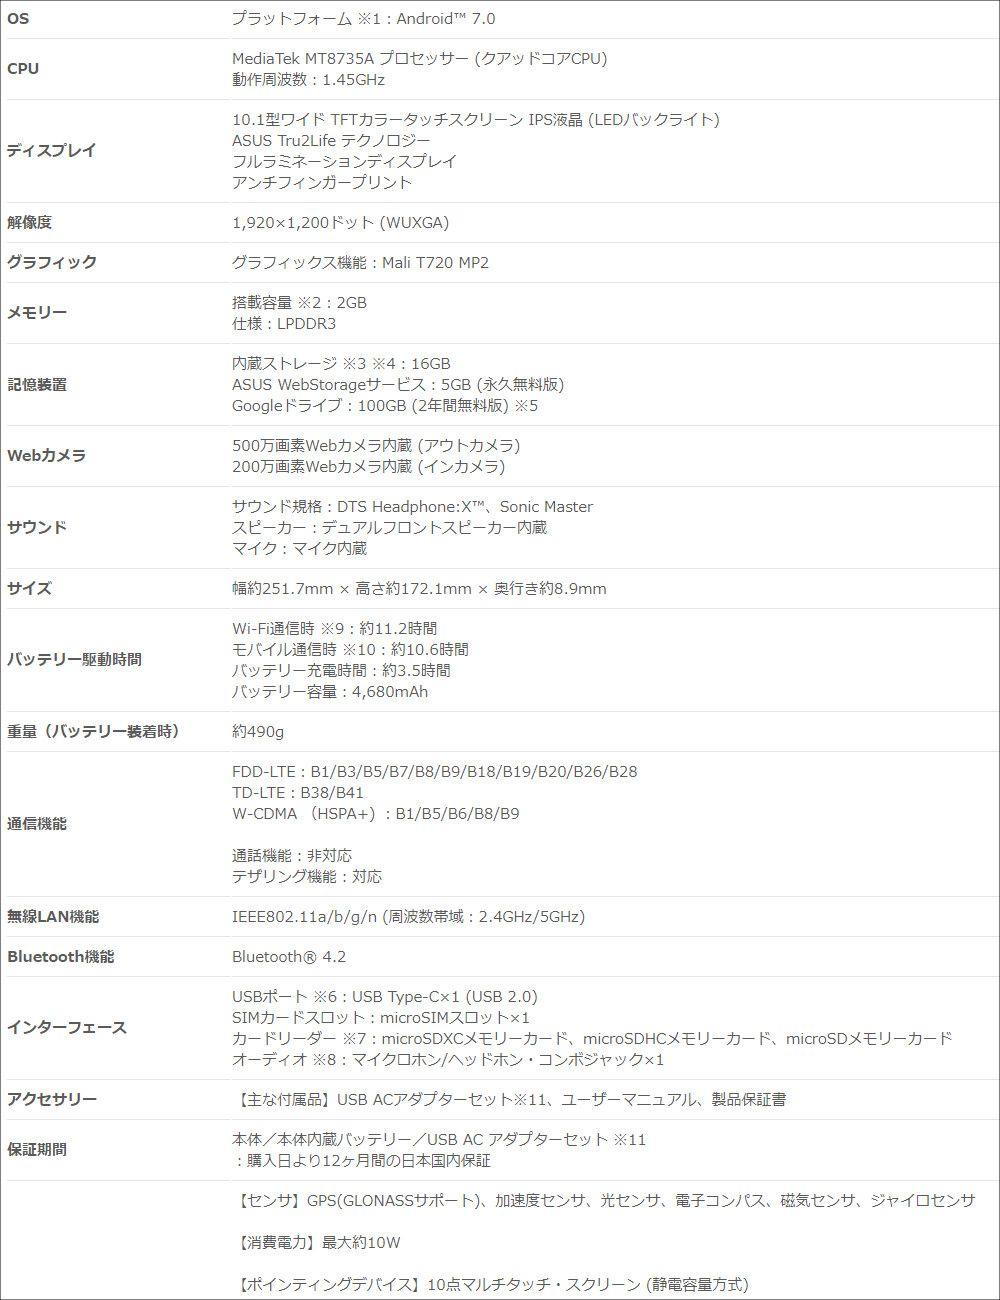 ASUS ZenPad 10 (Z301MFL) スペック表